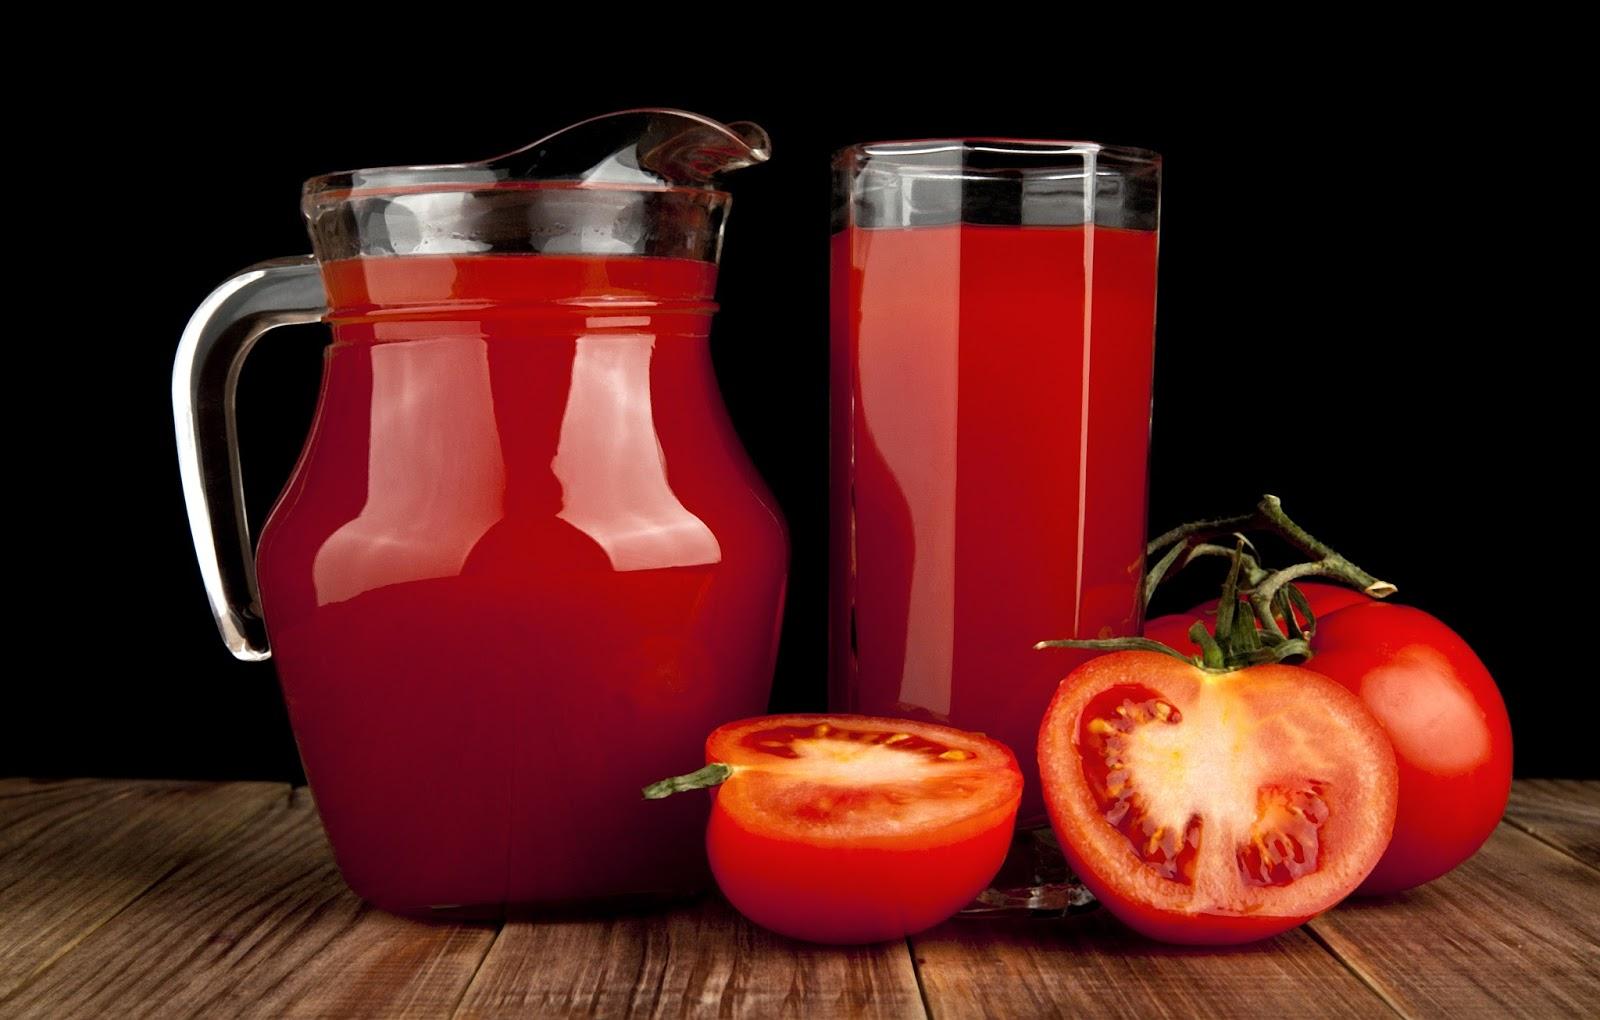 Jugo de tomate para bajar de peso   Como Bajar de Peso